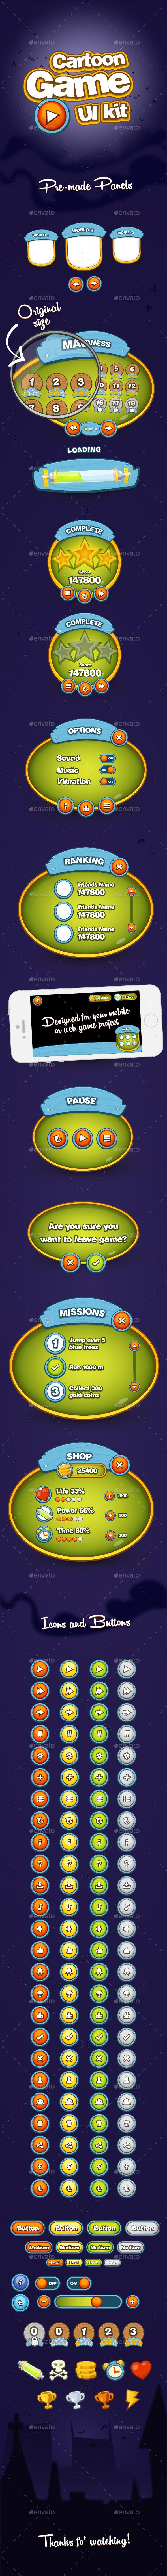 GraphicRiver Cartoon Game UI Kit 9324618